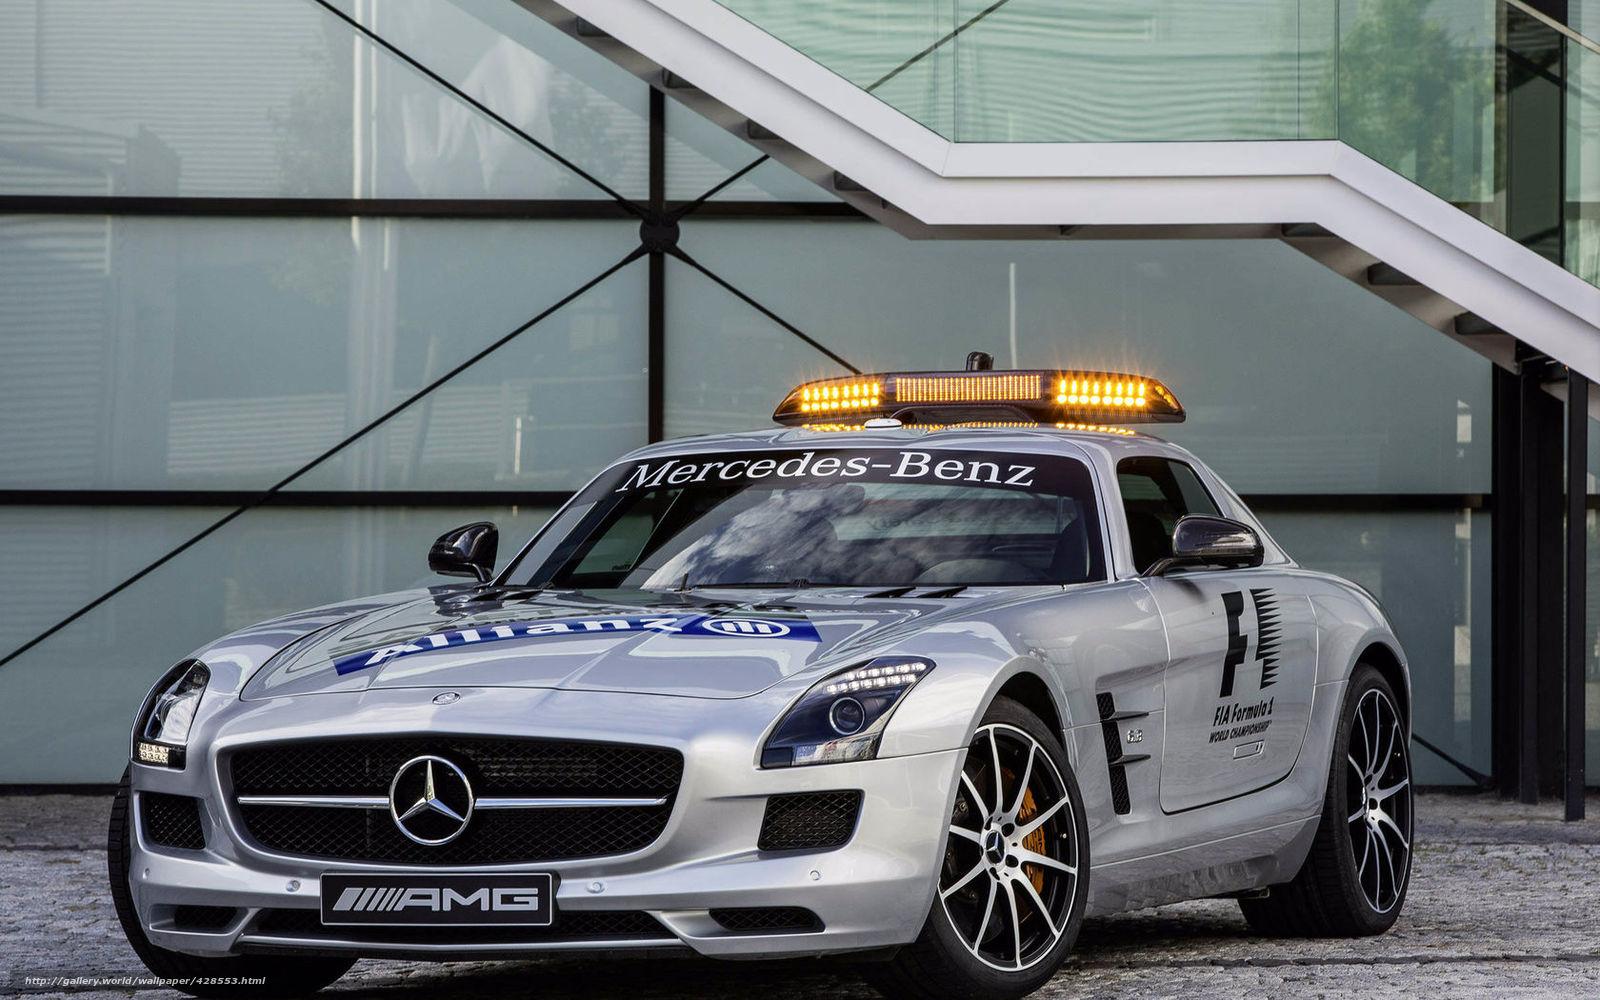 Гелик Гелендваген MercedesBenz BRABUS G 800  Картинки